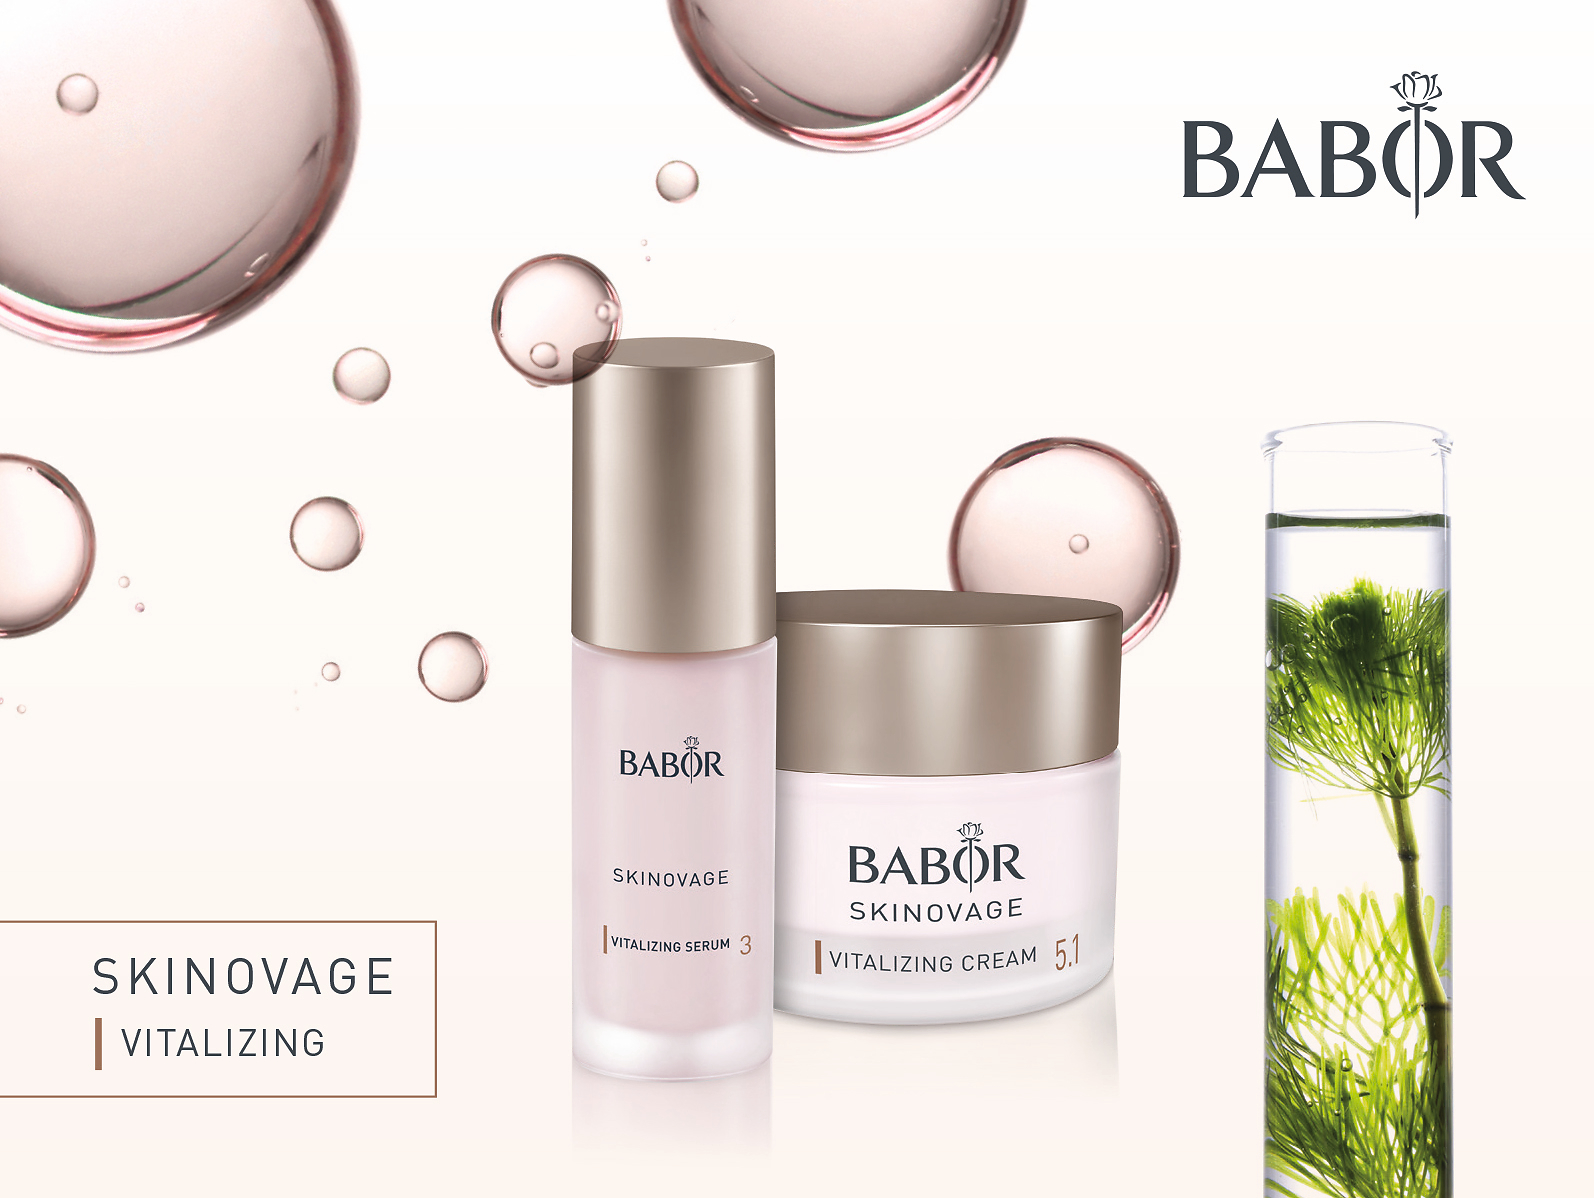 Skinovage Vitalizing